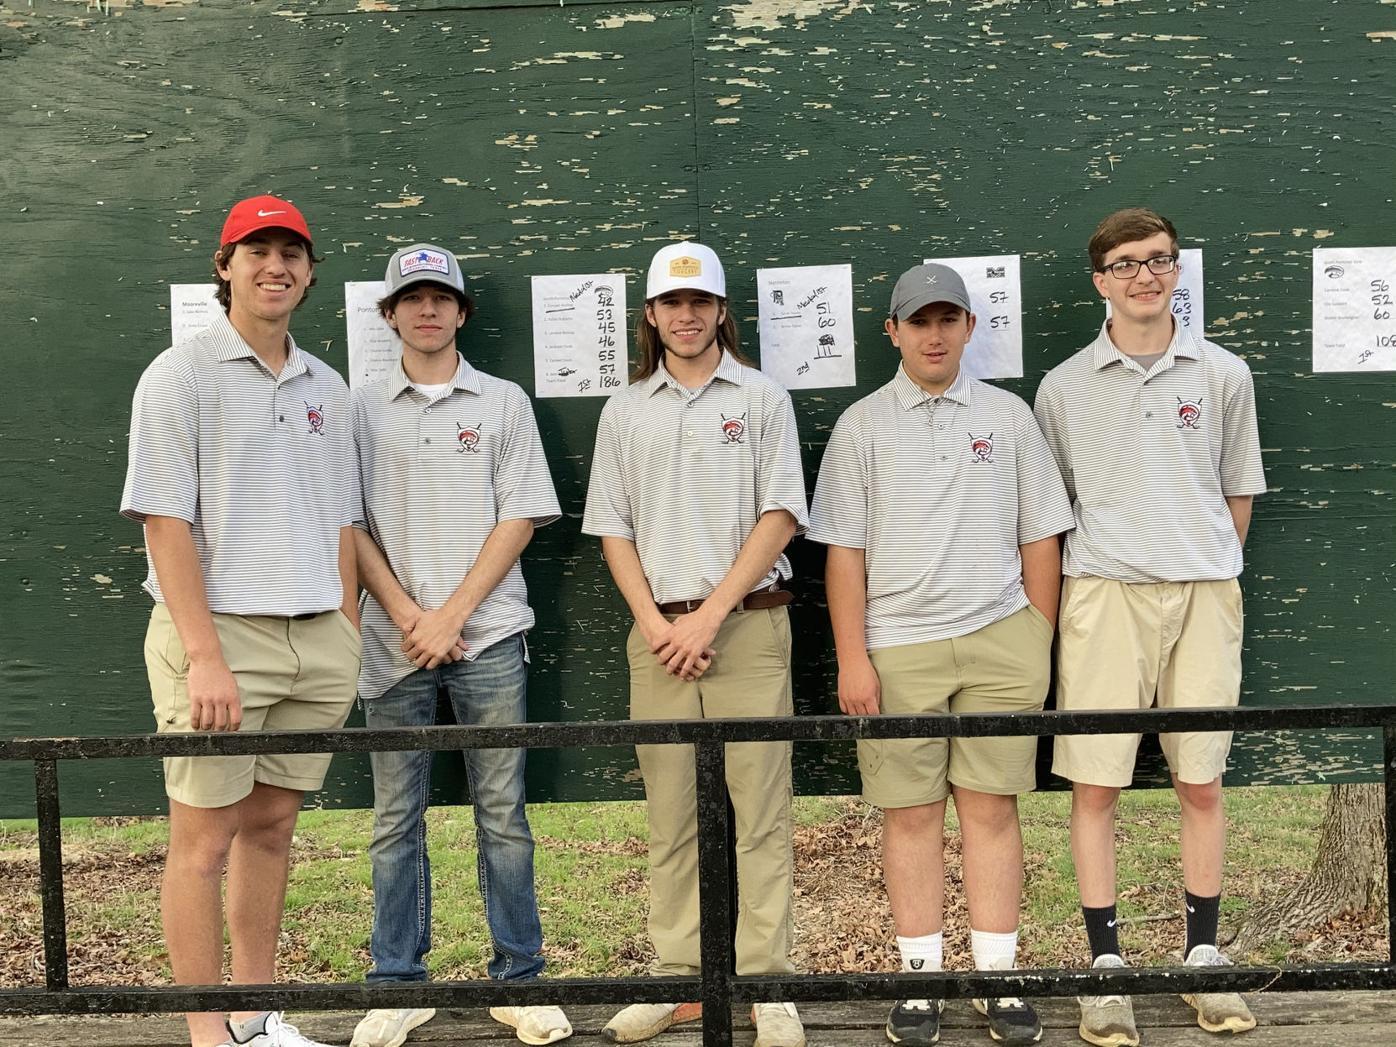 South Boys Golf